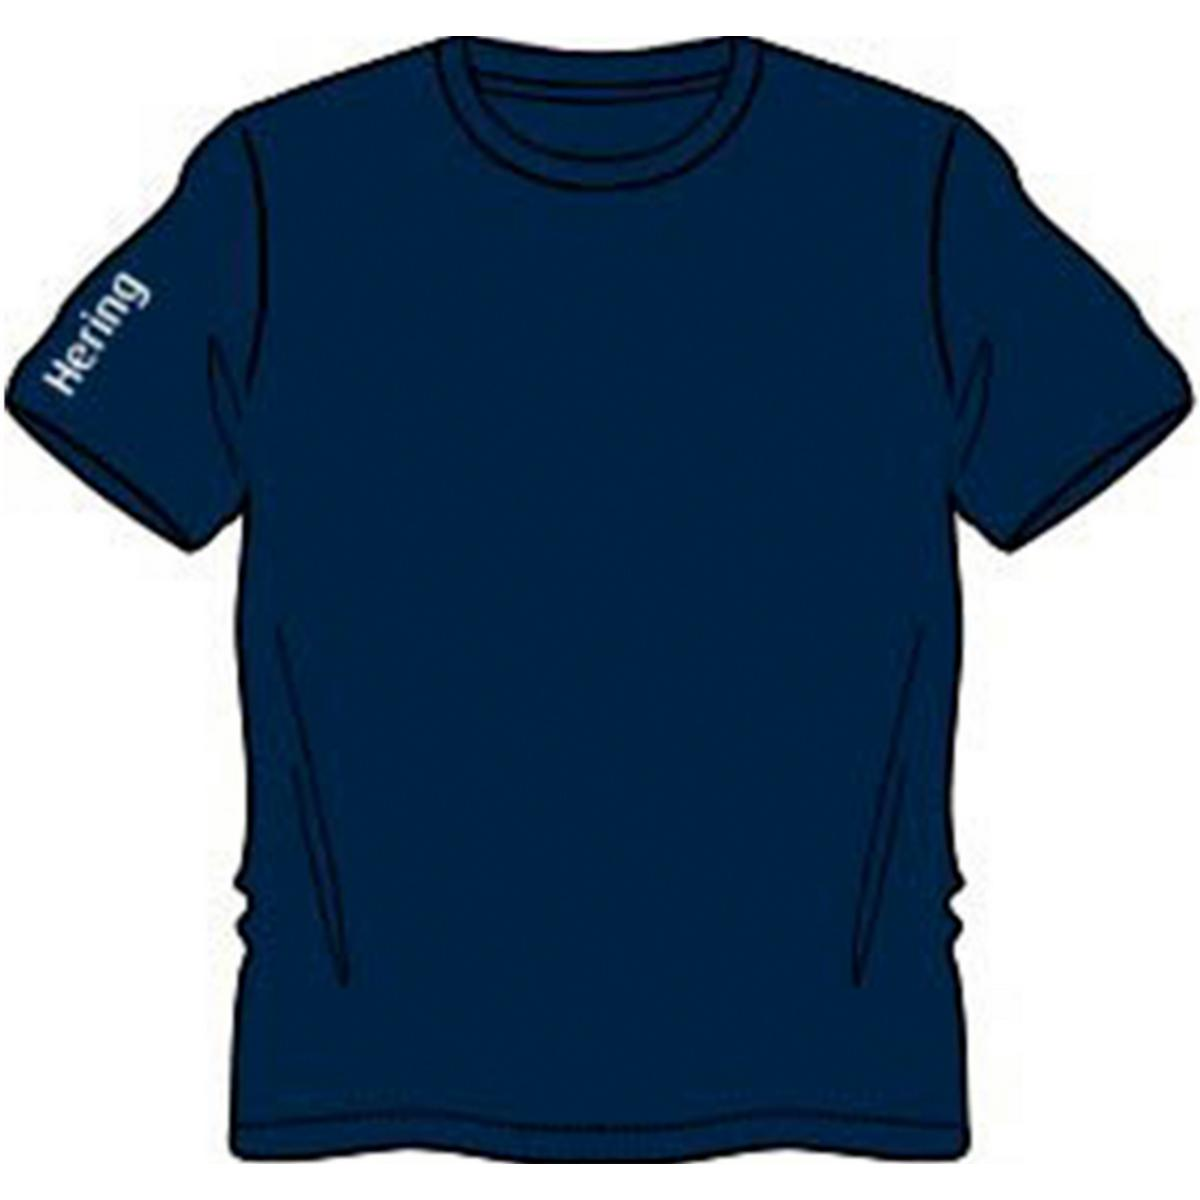 Camiseta Masculina Hering 4ey8 Ax7en Marinho